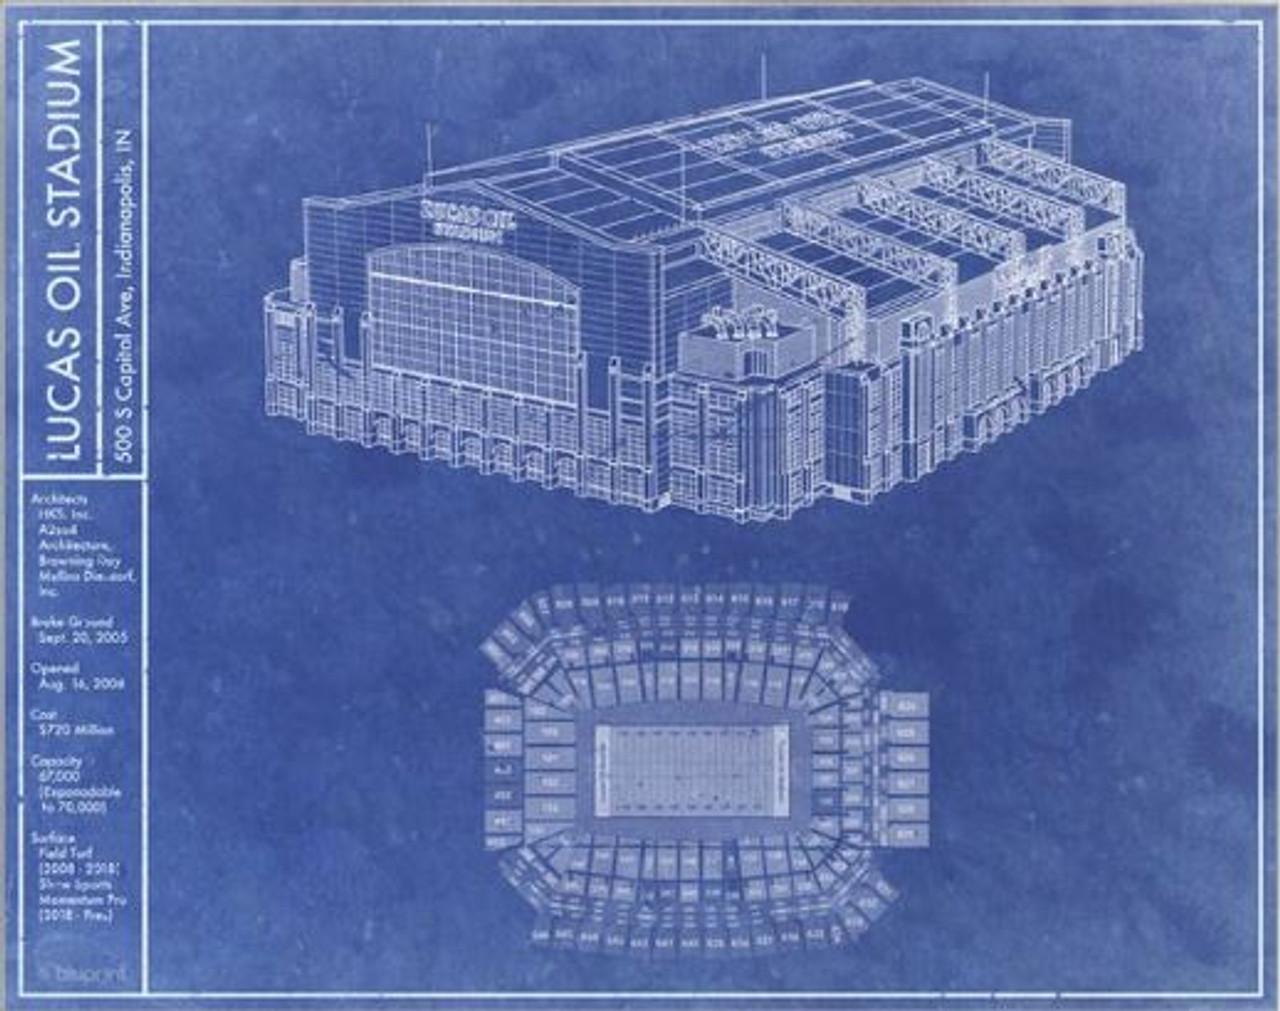 Lucas Oil Stadium - Indianapolis Colts Blueprint Poster